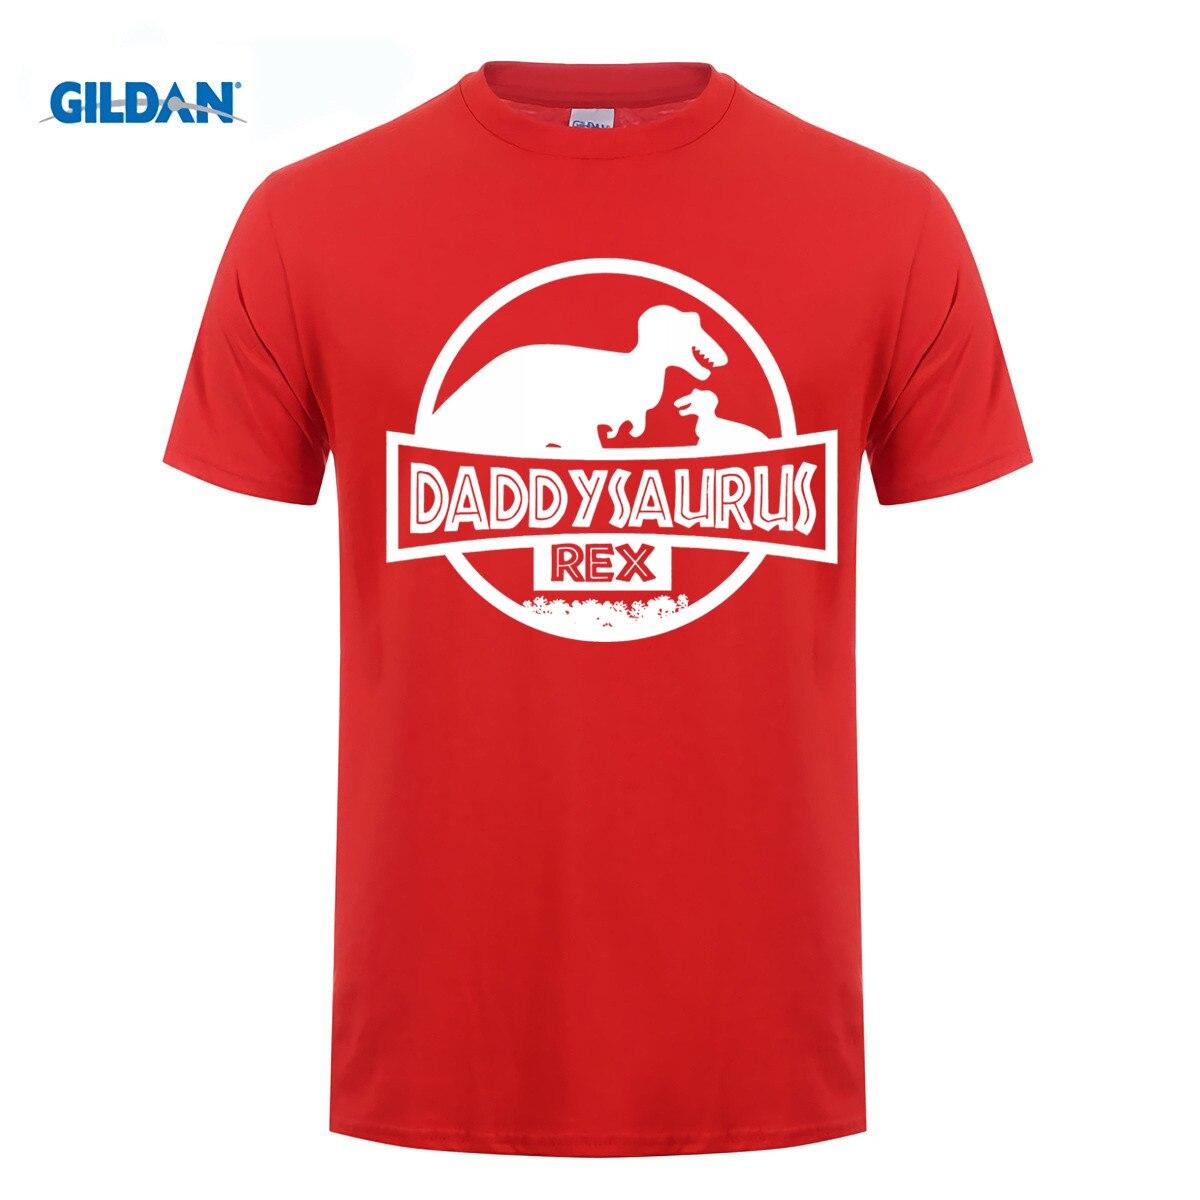 GILDAN 100% cotton O-neck printed T-shirt Fathers Day Shirt Dinosaur Shirt Daddysaurus Rex